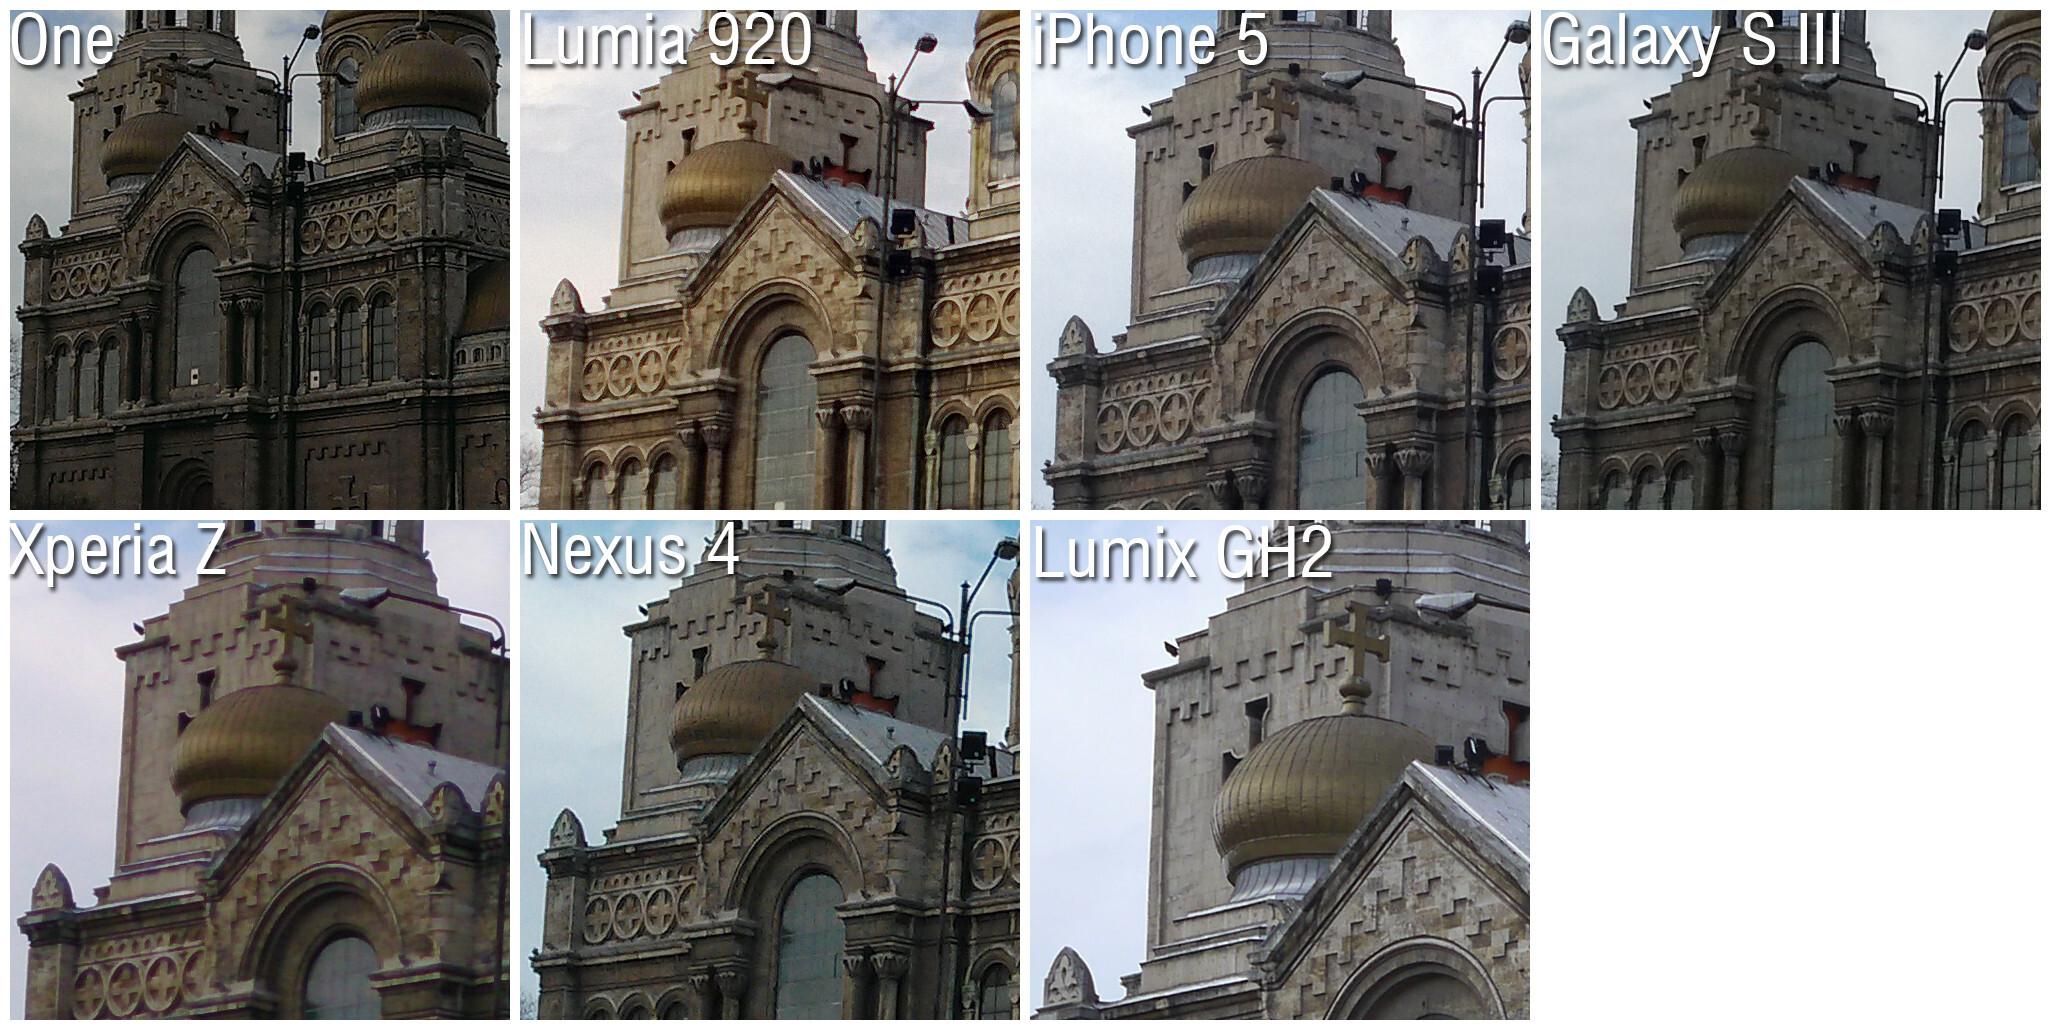 http://i-cdn.phonearena.com/images/reviews/129428-image/01-100-crop-details.jpg